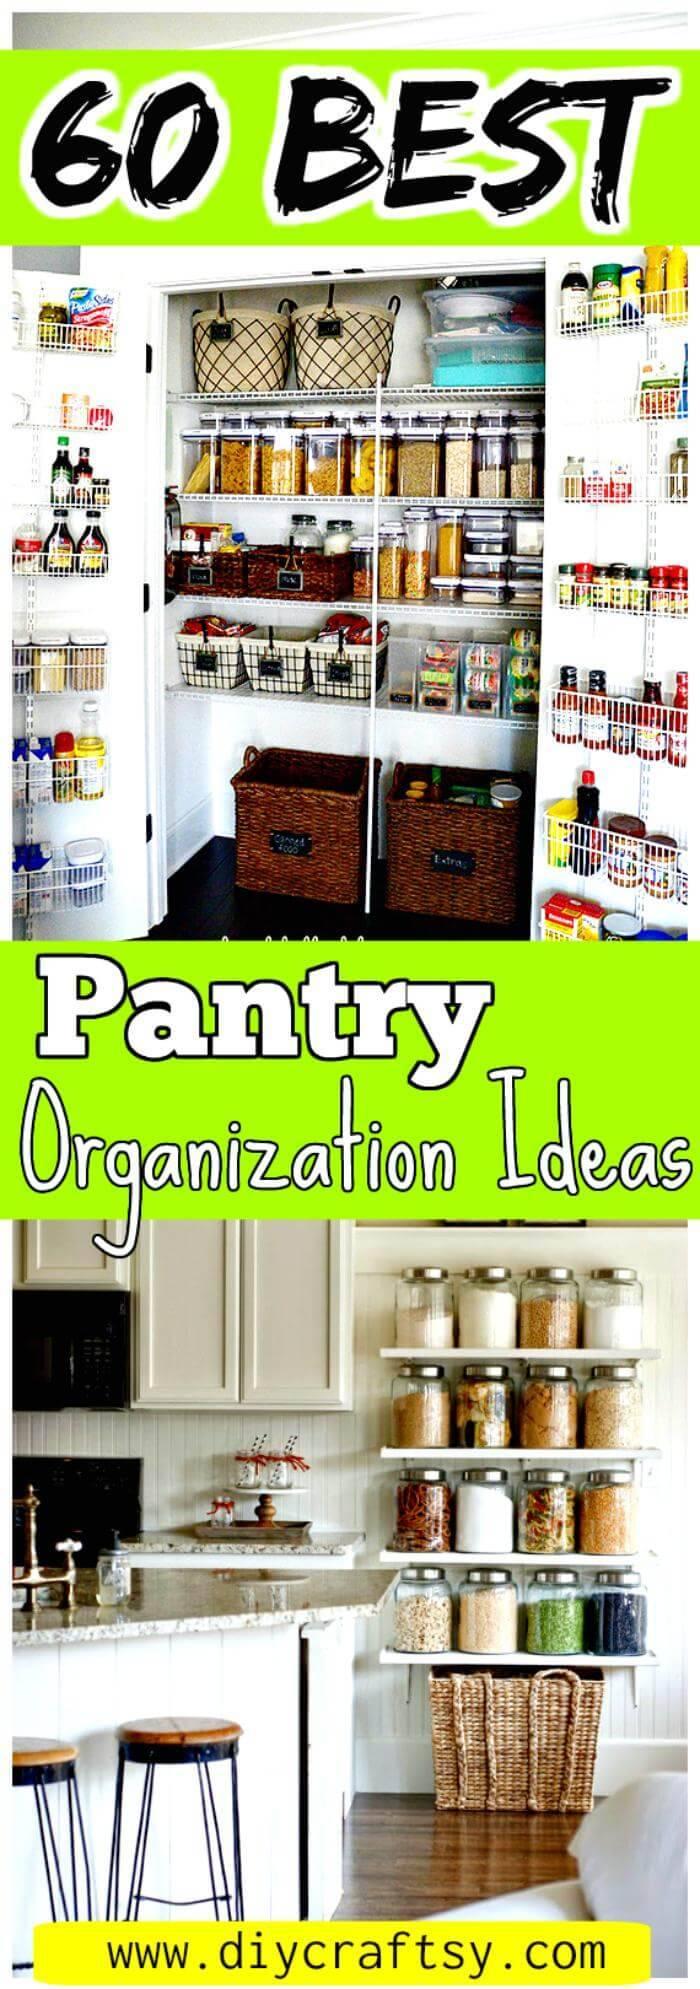 Pantry Organization